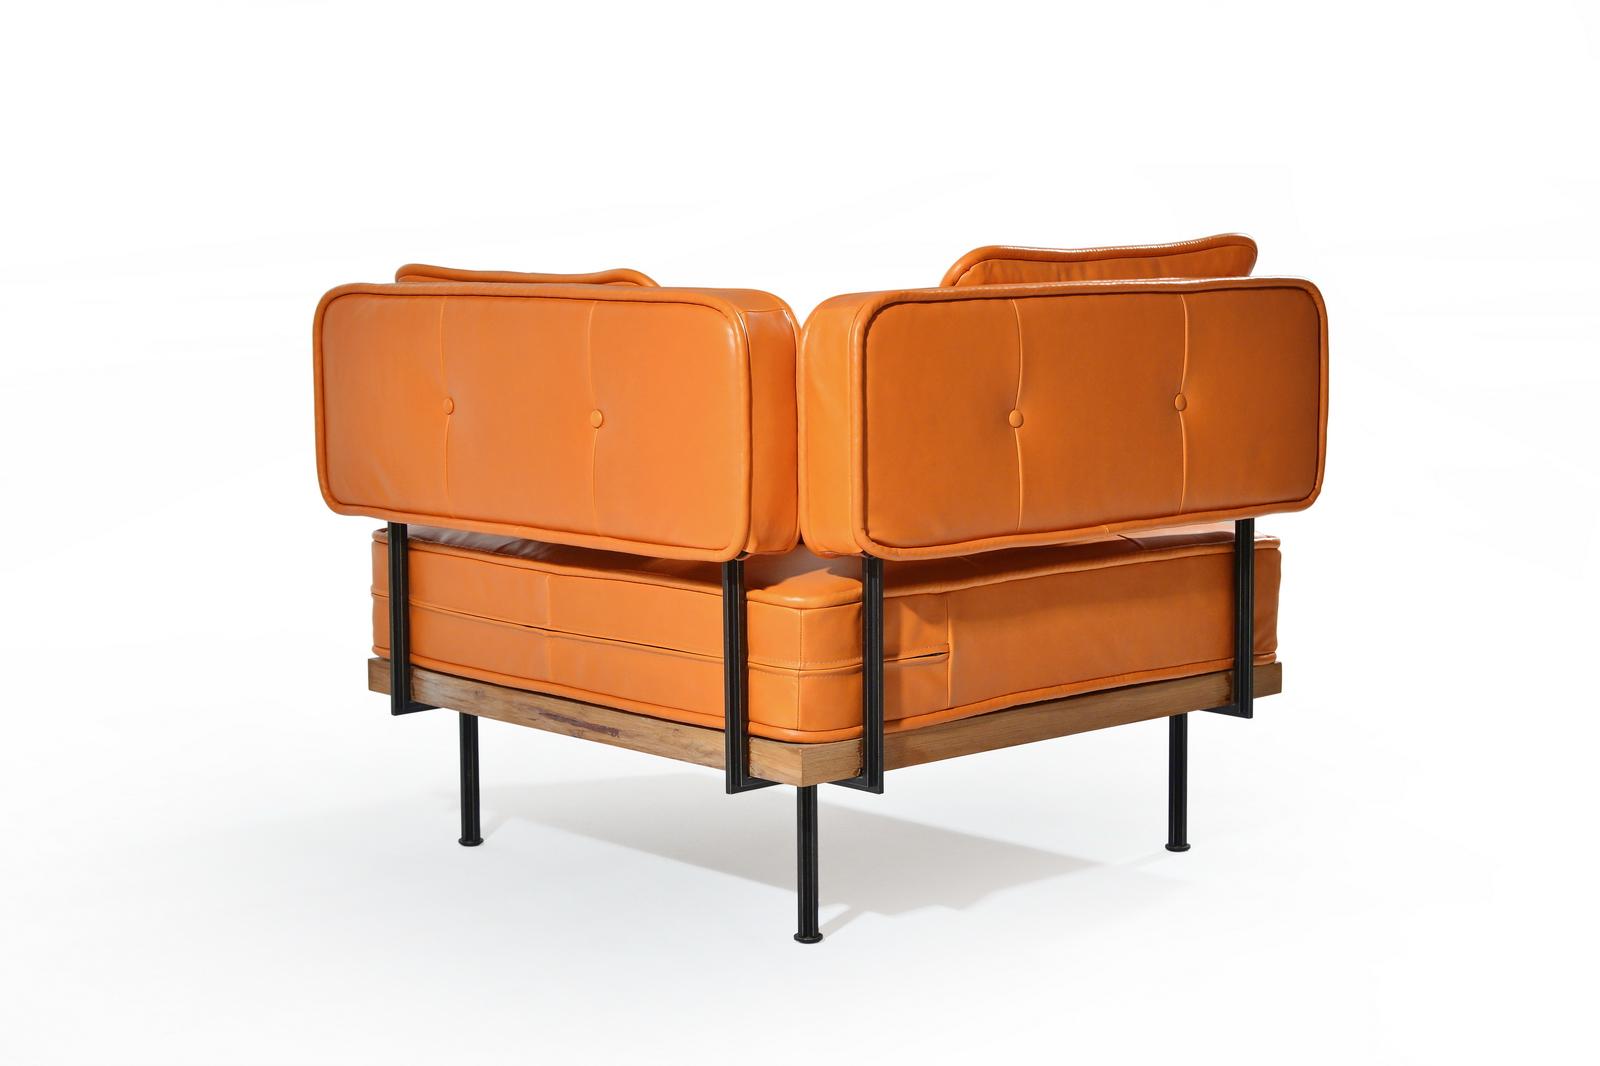 PTendercool-Sofa Corner-BS3-TE-BL-NO-Leather-210623-21